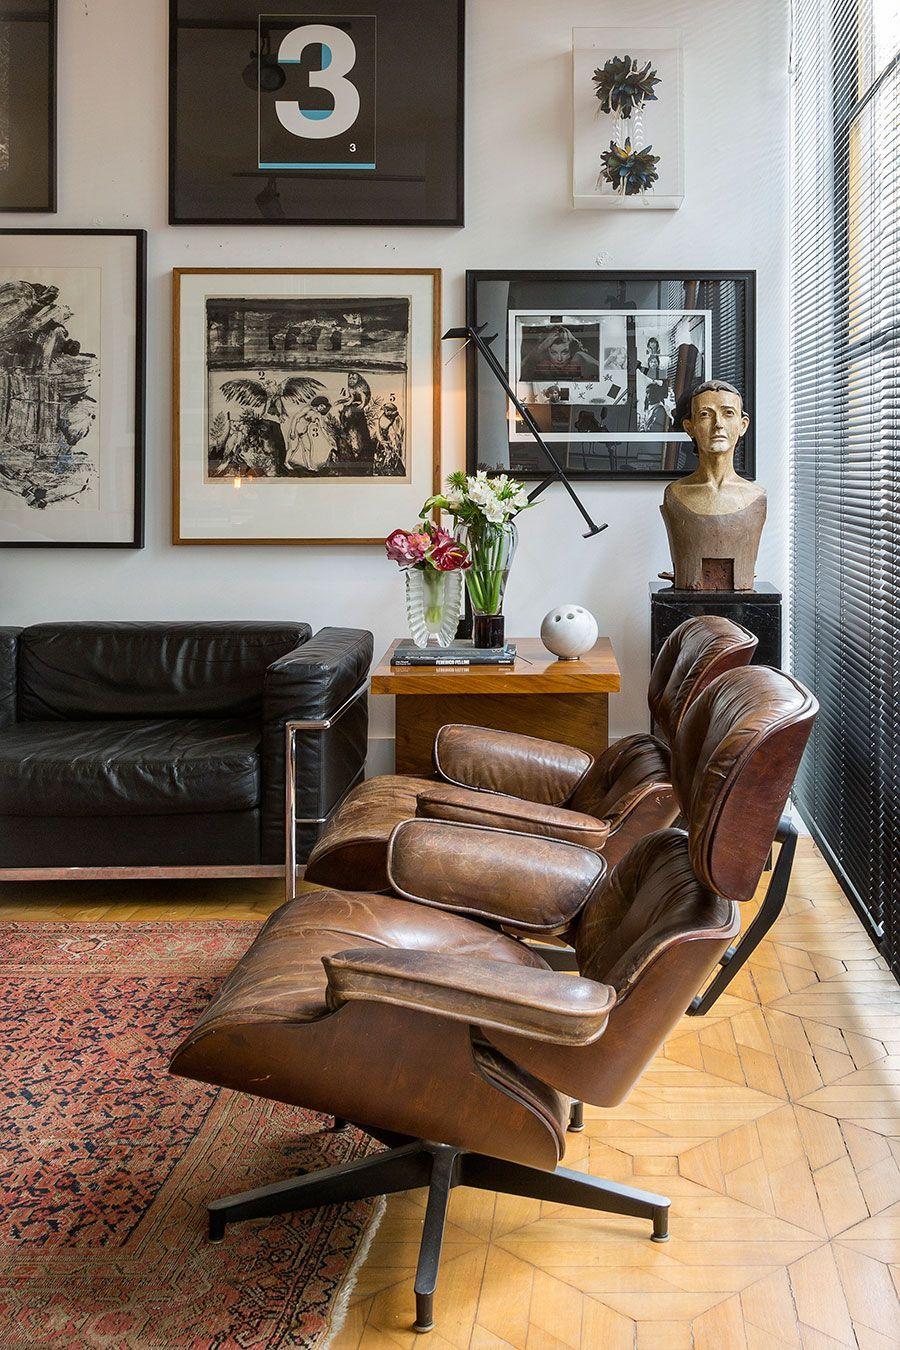 Pilati Interior Design : All The Good Reasons To Visit #interiordesignkitchen